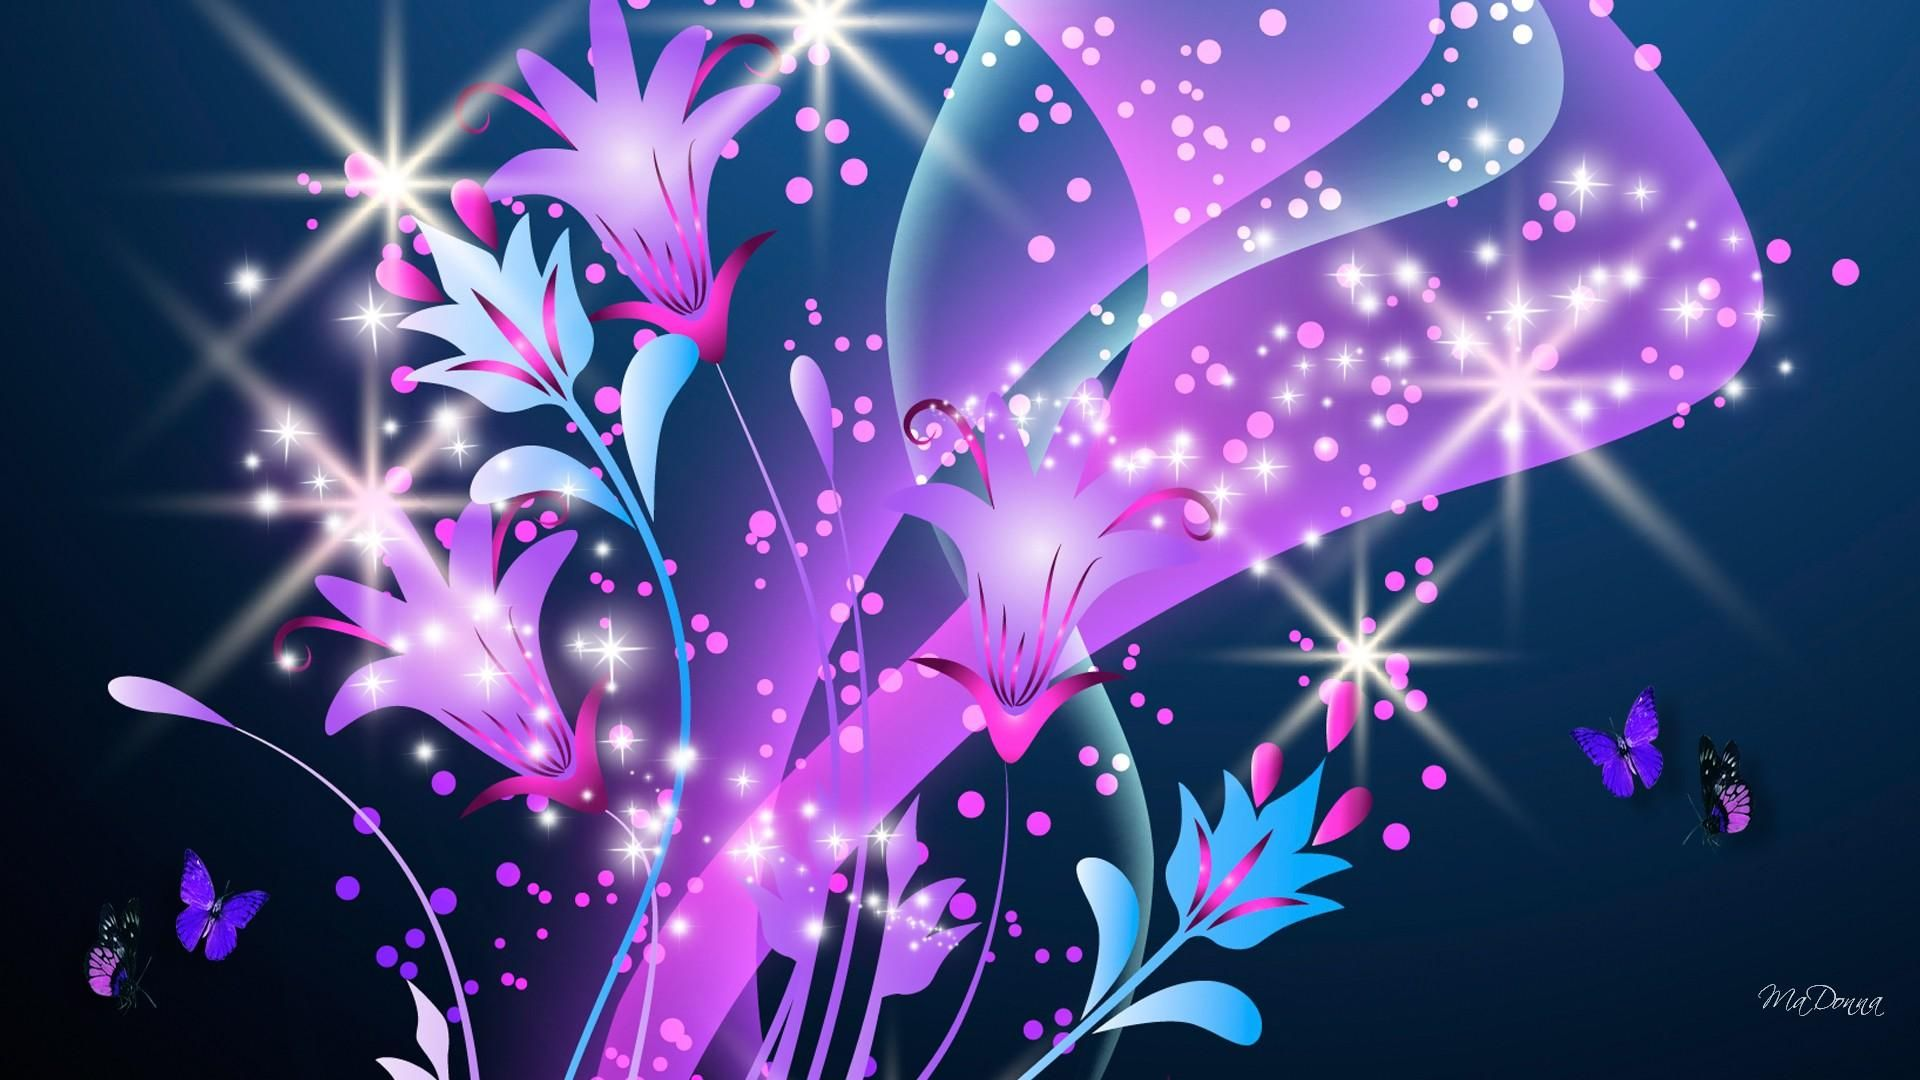 Hd Glitter Roses Wallpaper Novo Pink Glitter Wallpaper Glitter